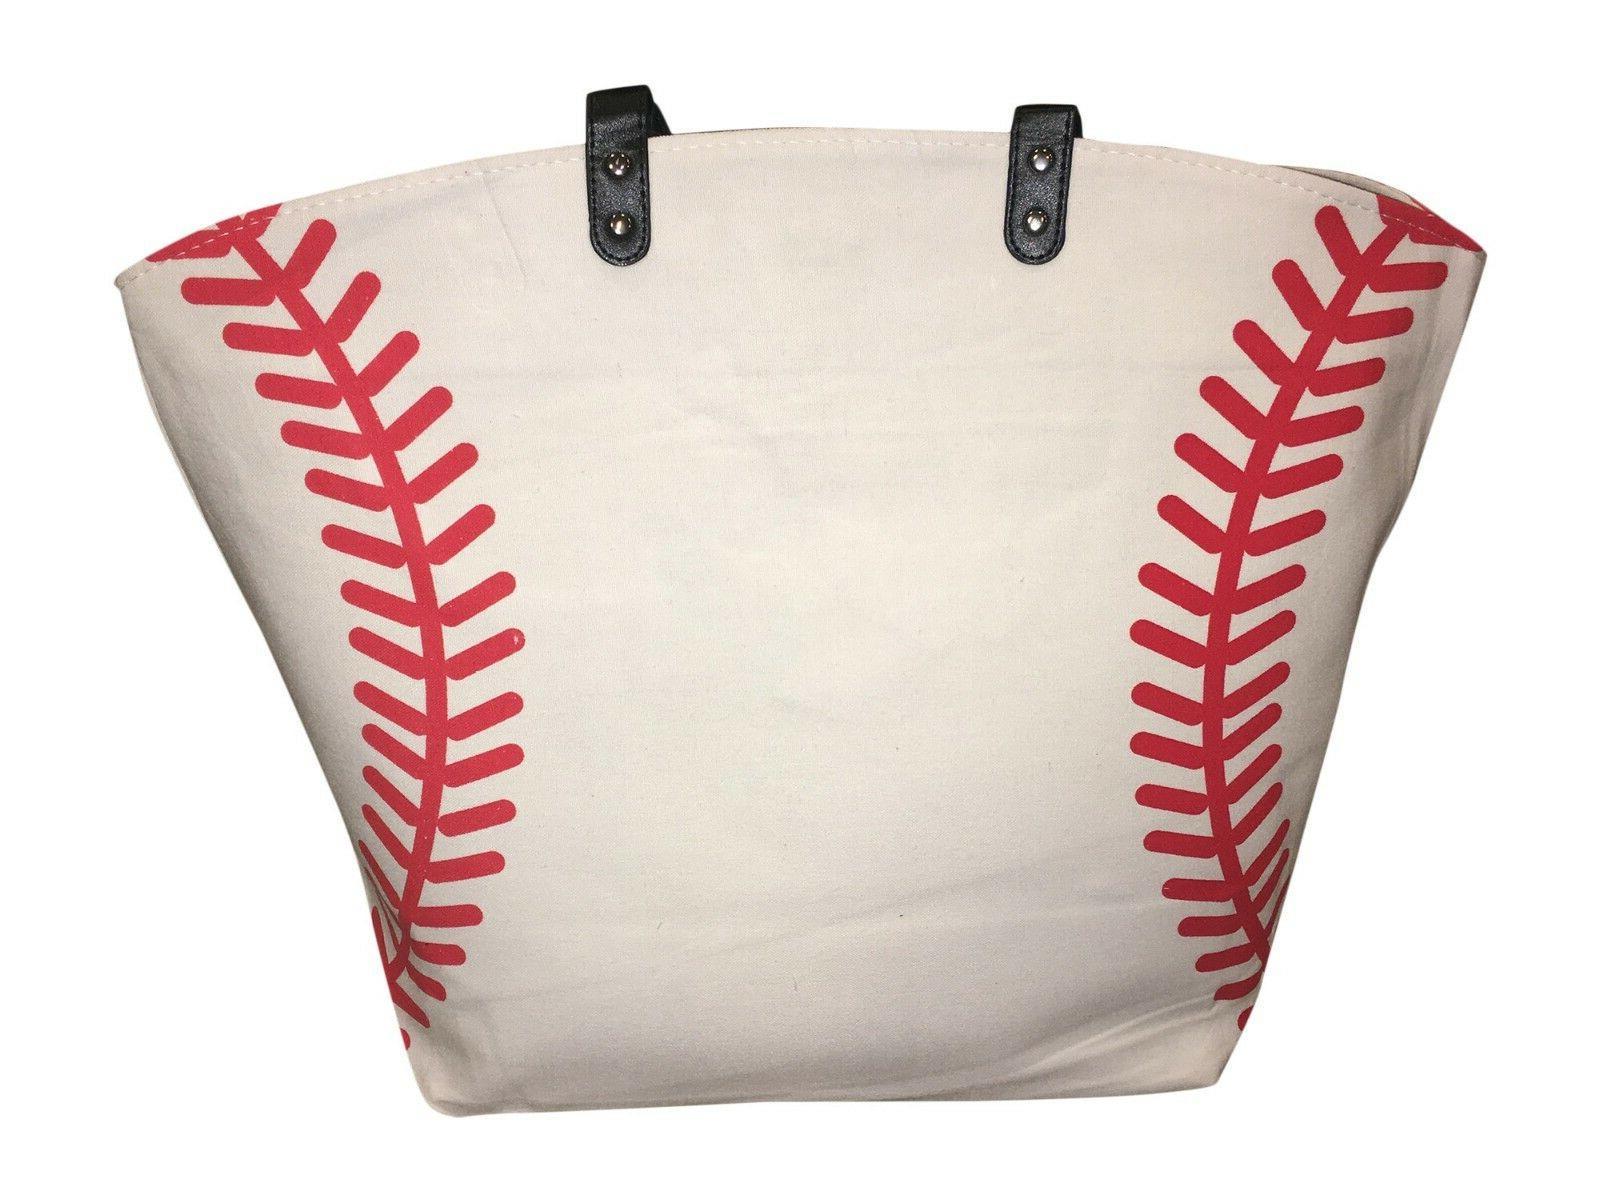 white baseball seam canvas tote bag purse